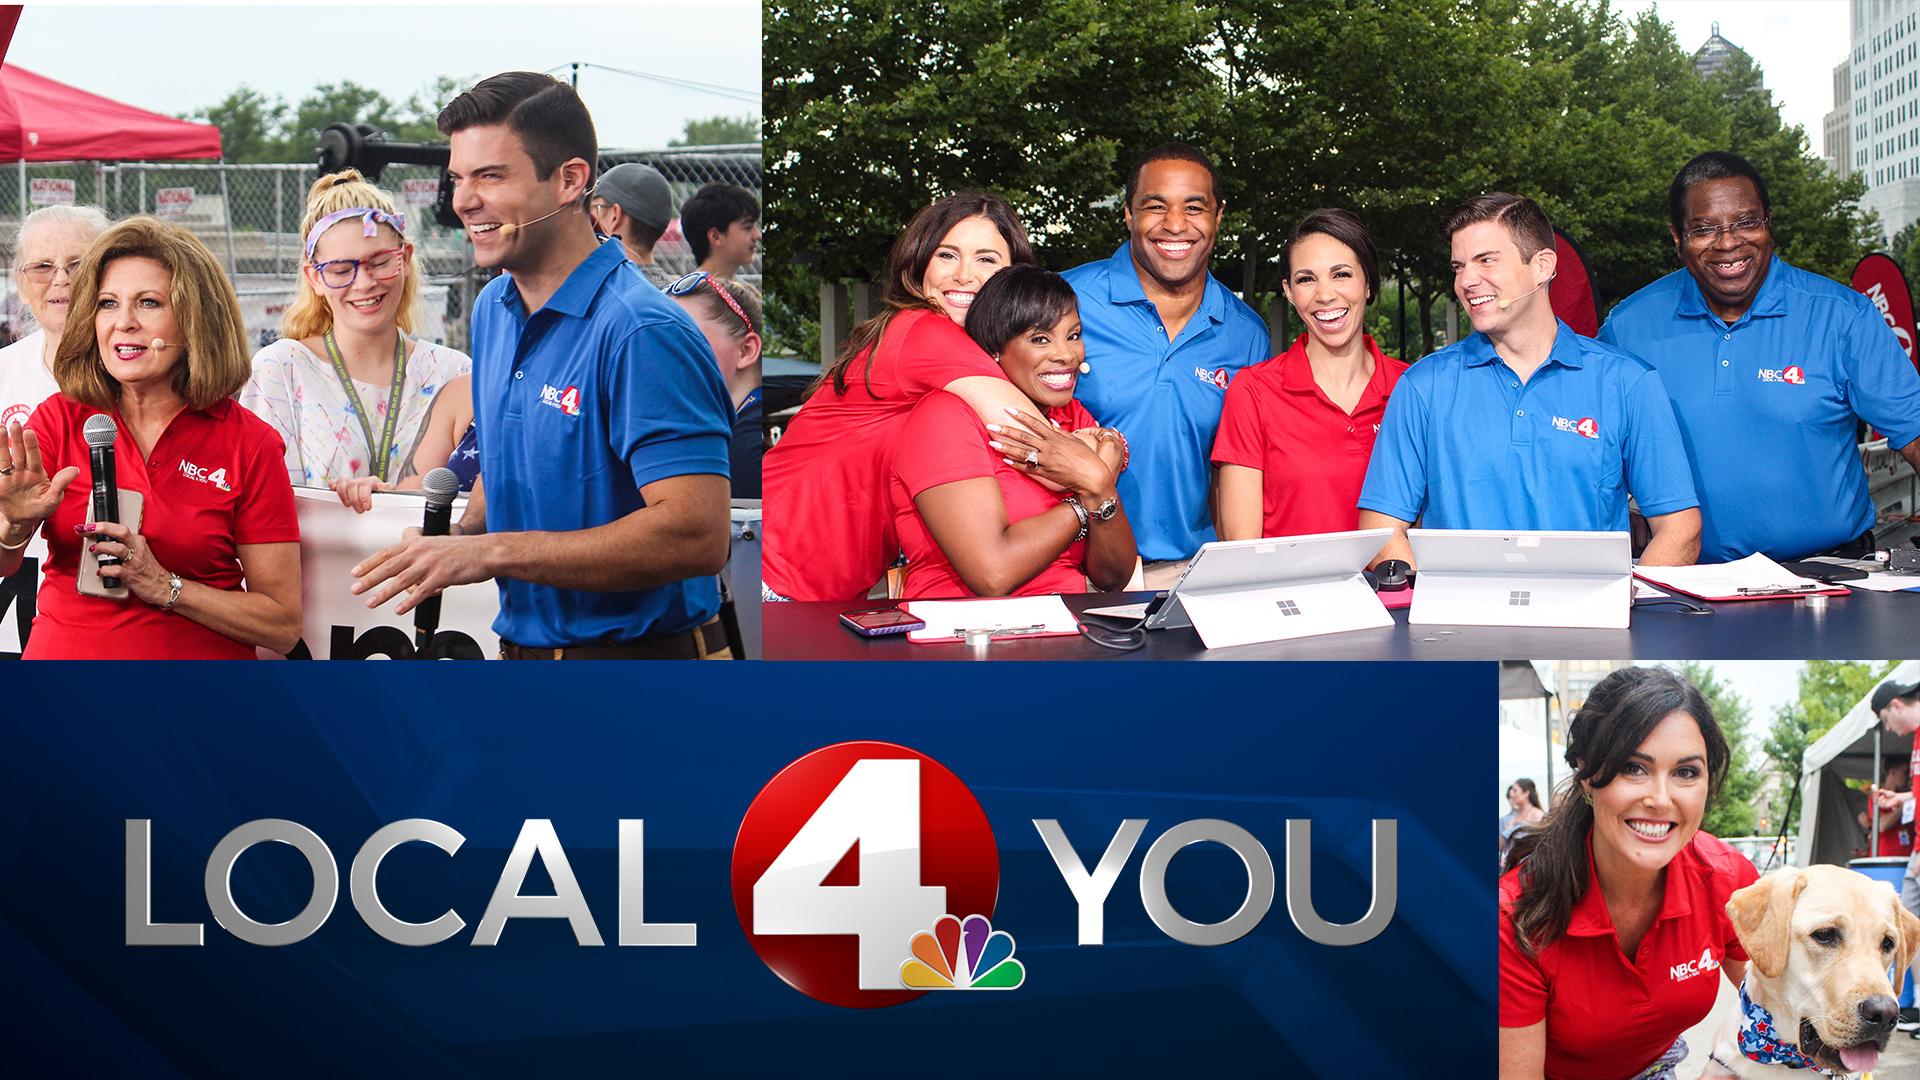 NBC4 remains Local 4 You despite AT&T/DIRECTV blackout